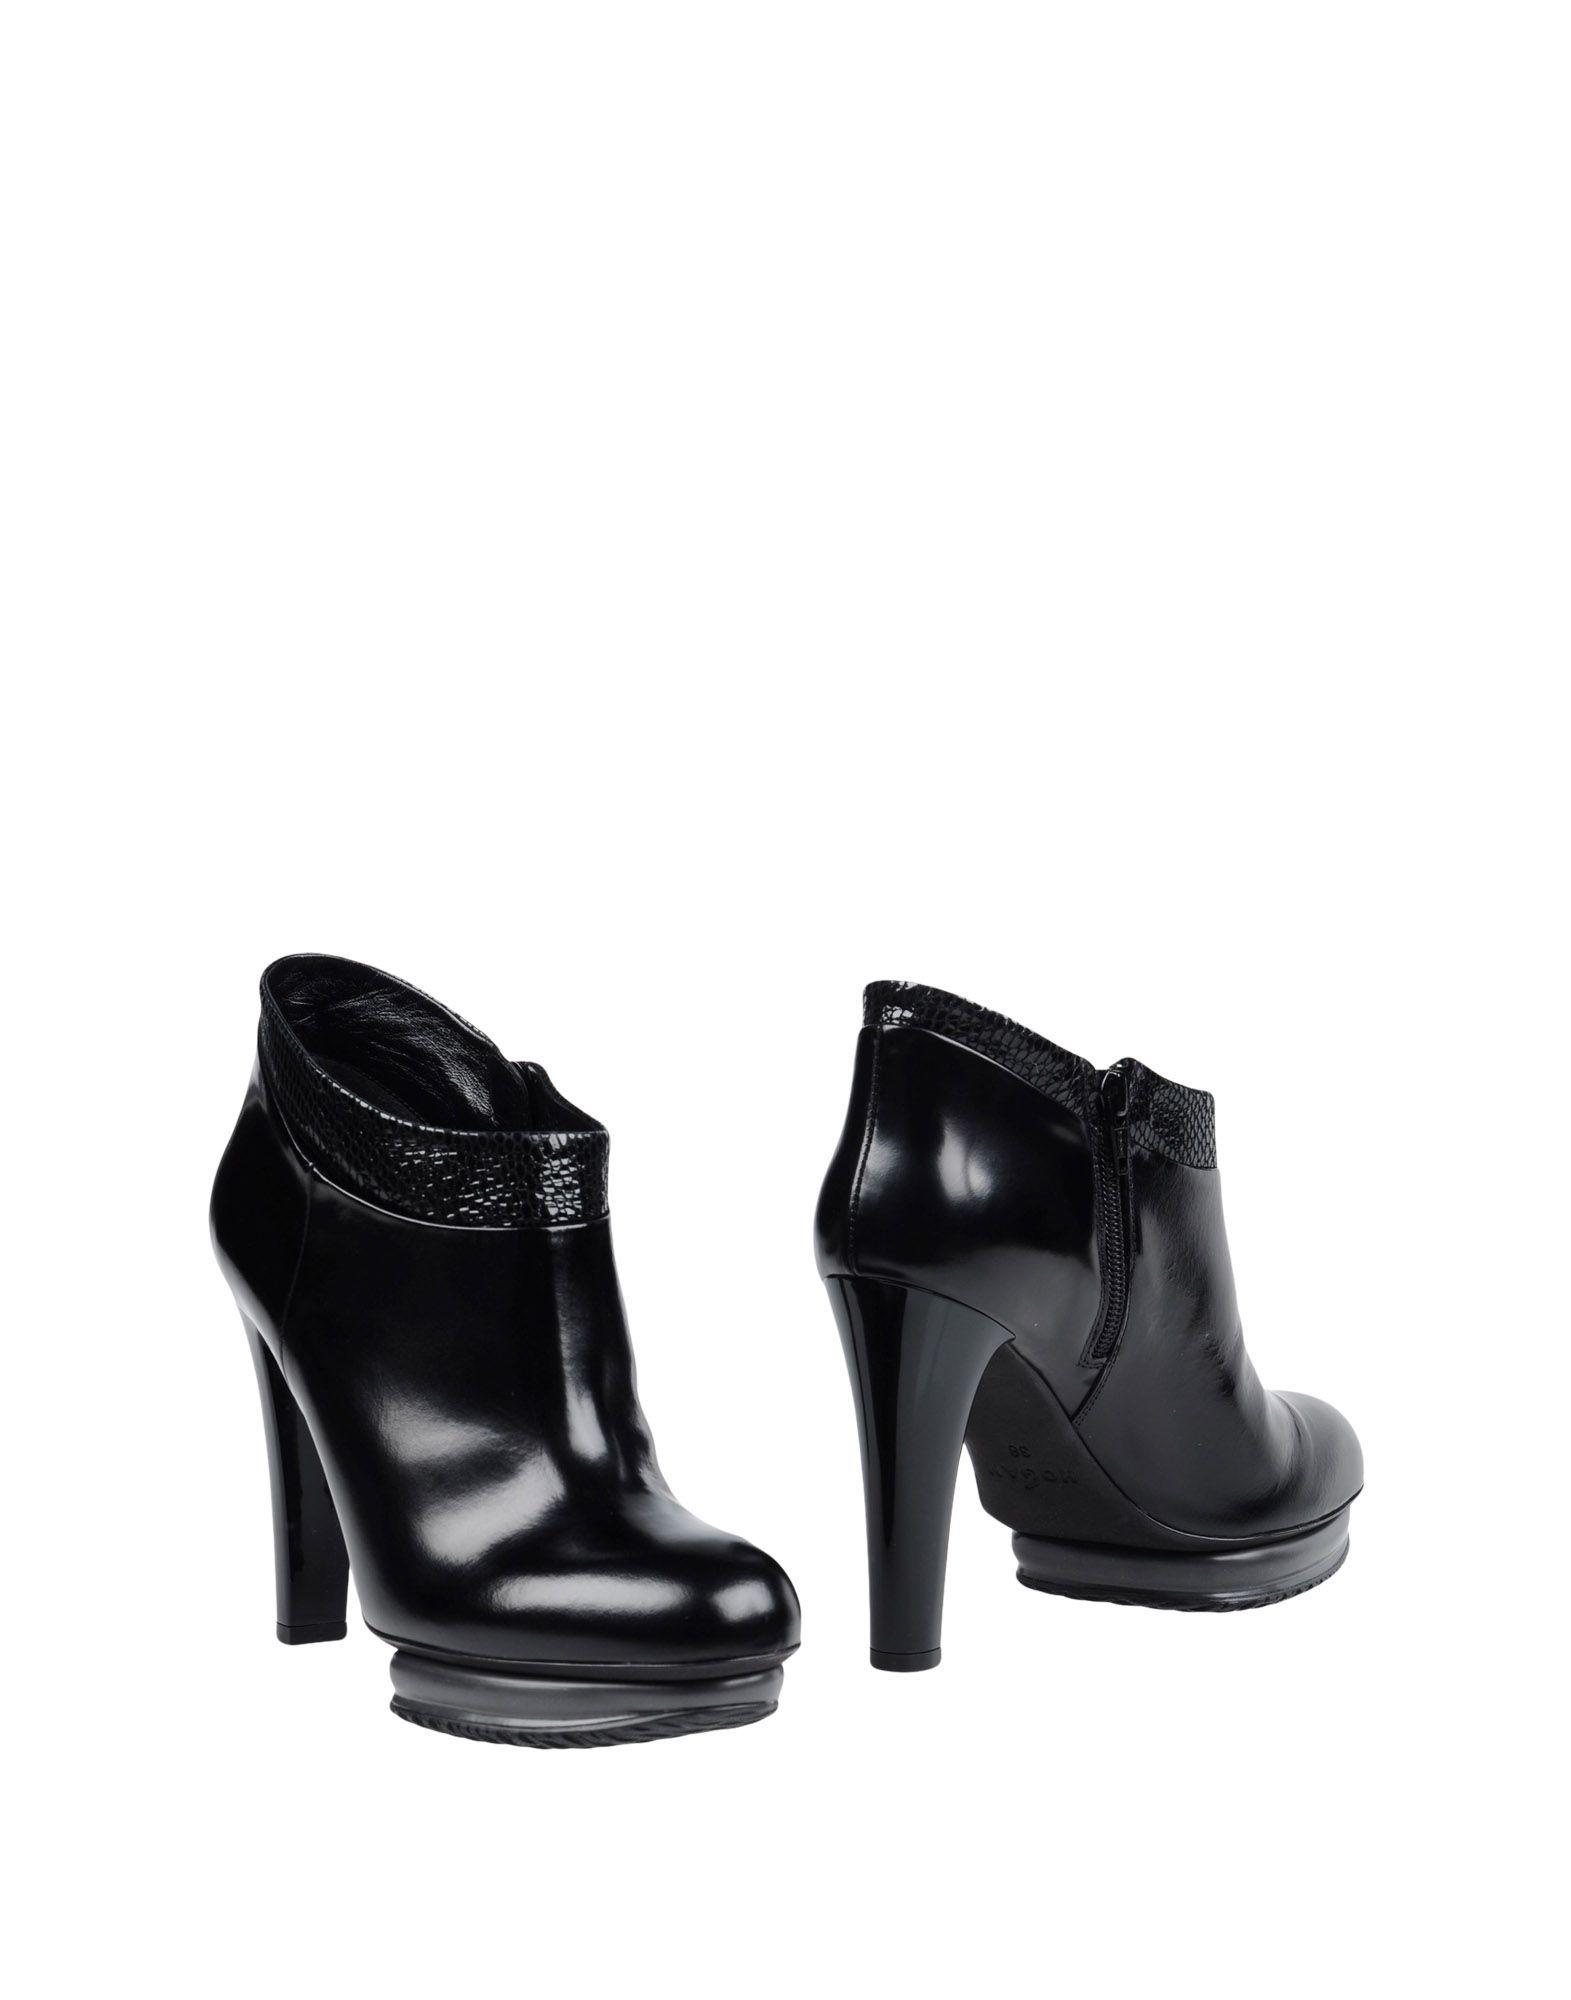 Hogan Black Leather Heeled Ankle Boots